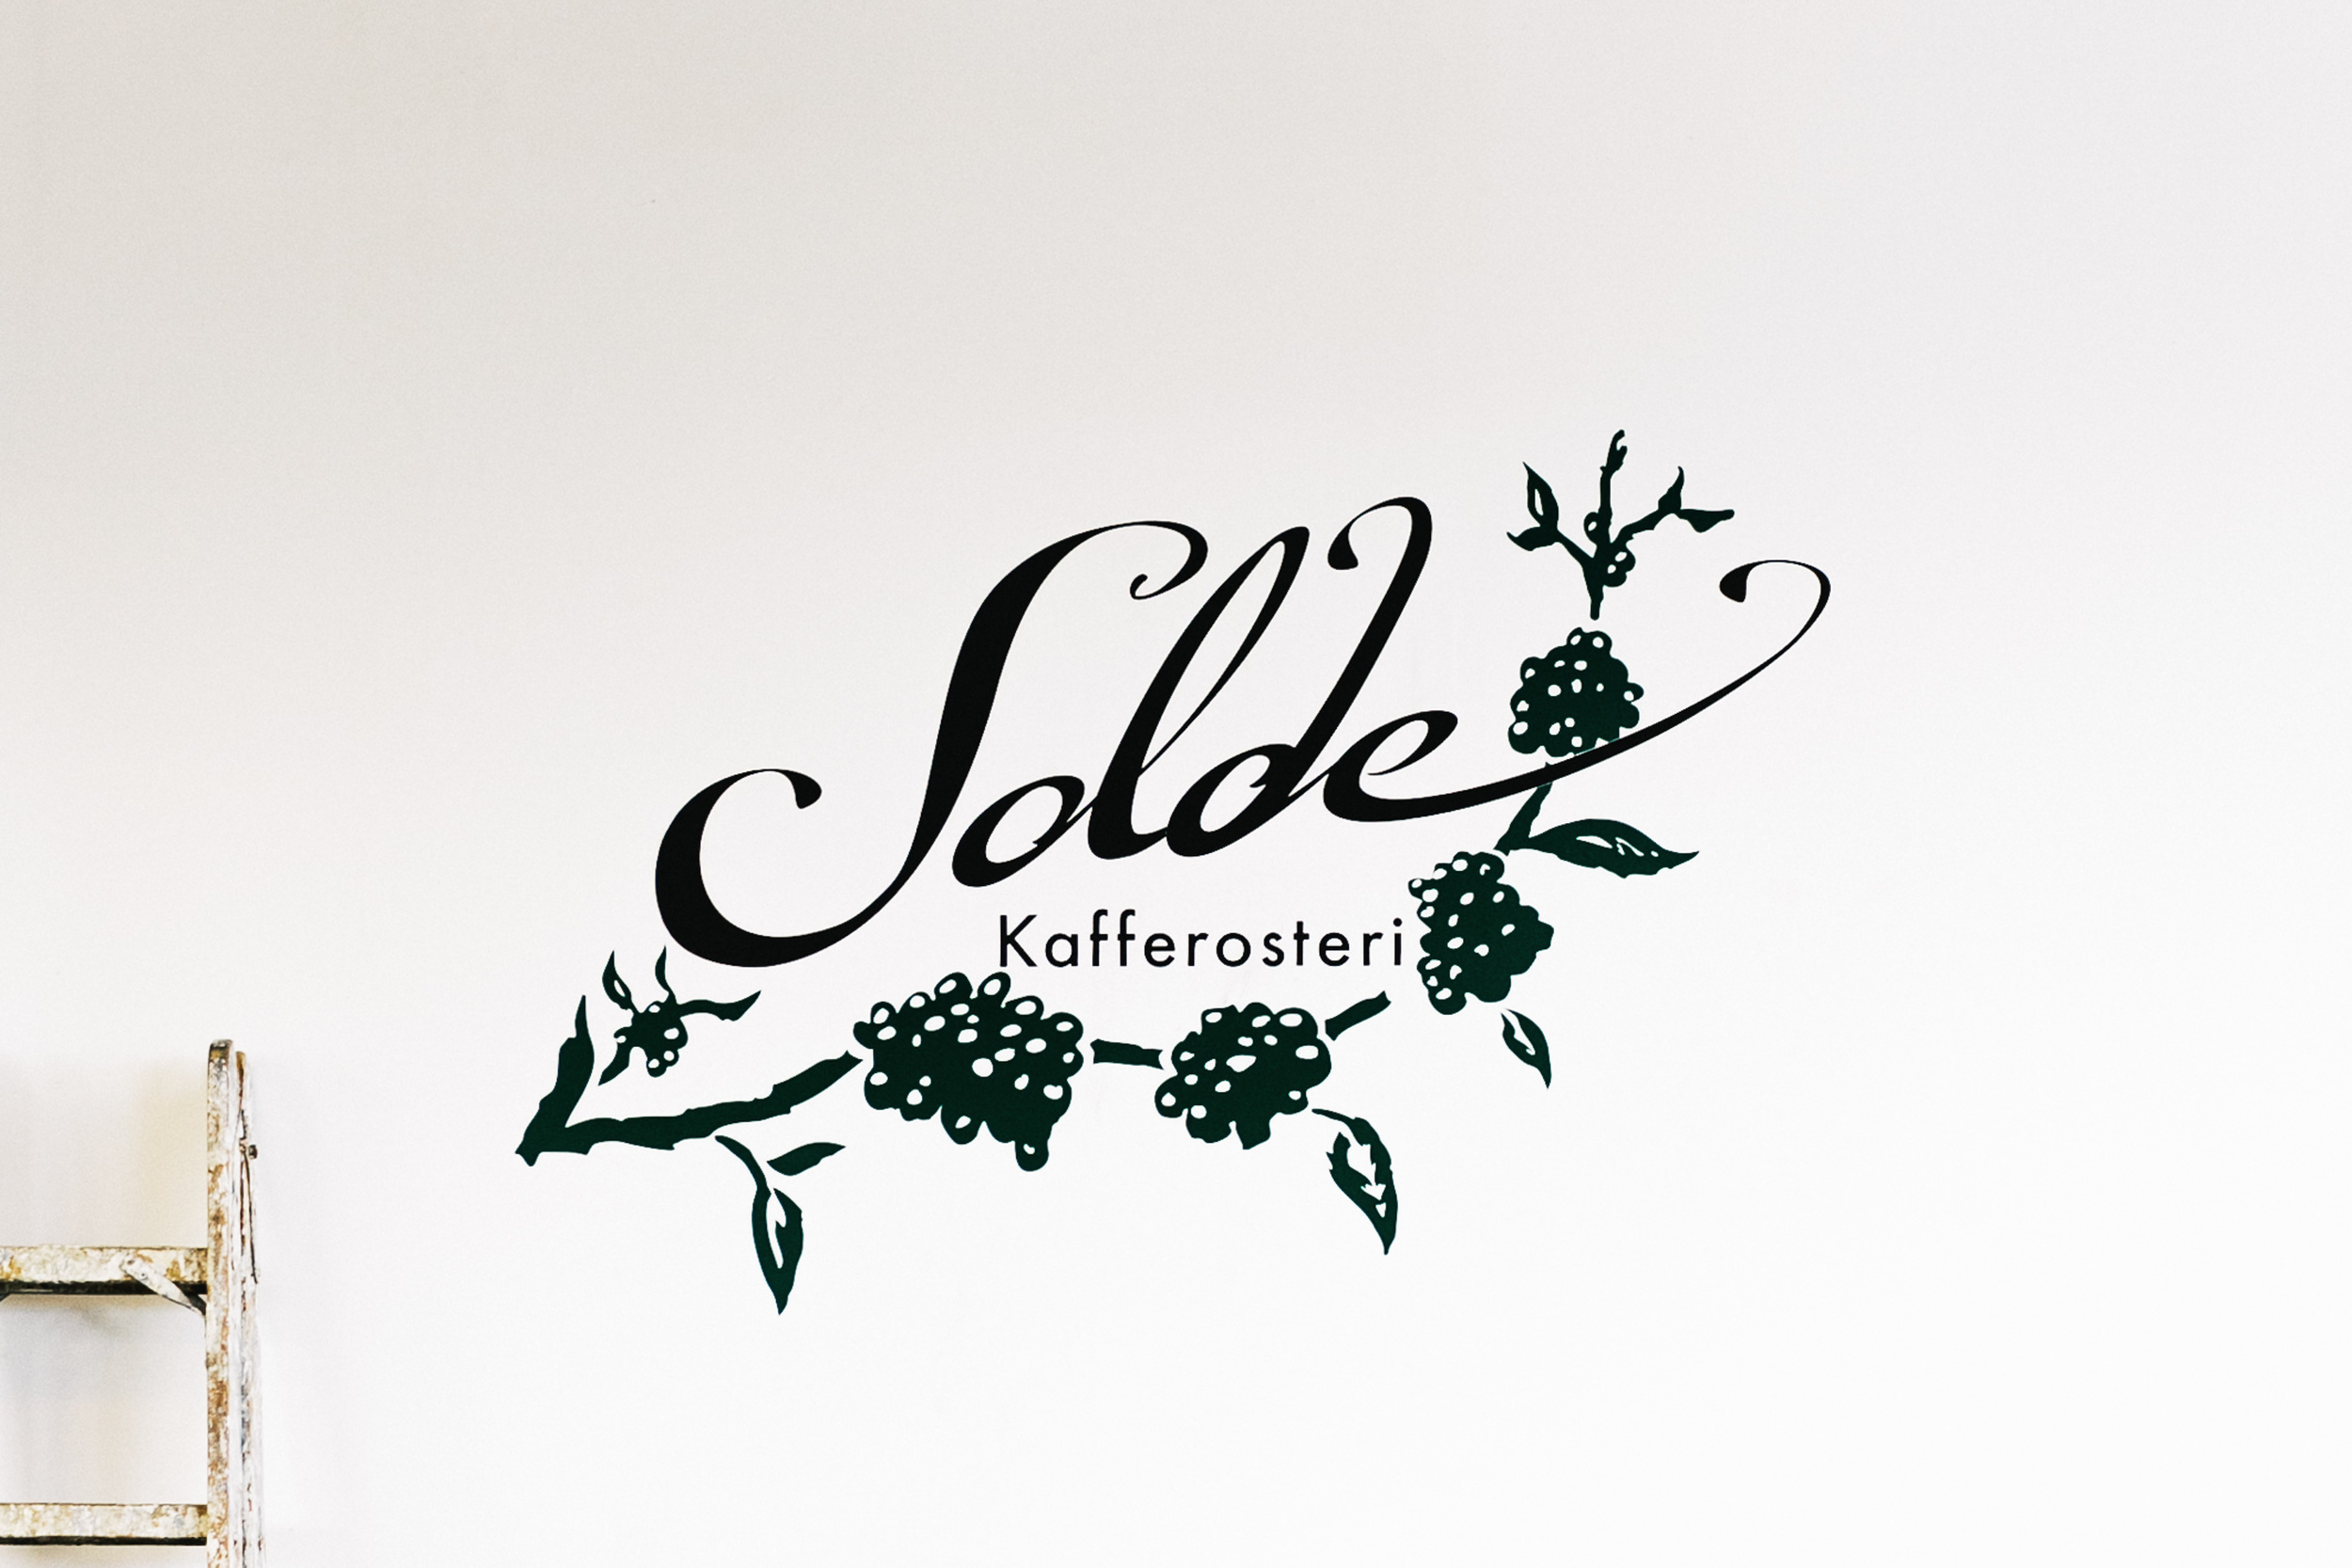 161802_SOLDE_MALMÖ-4.JPG